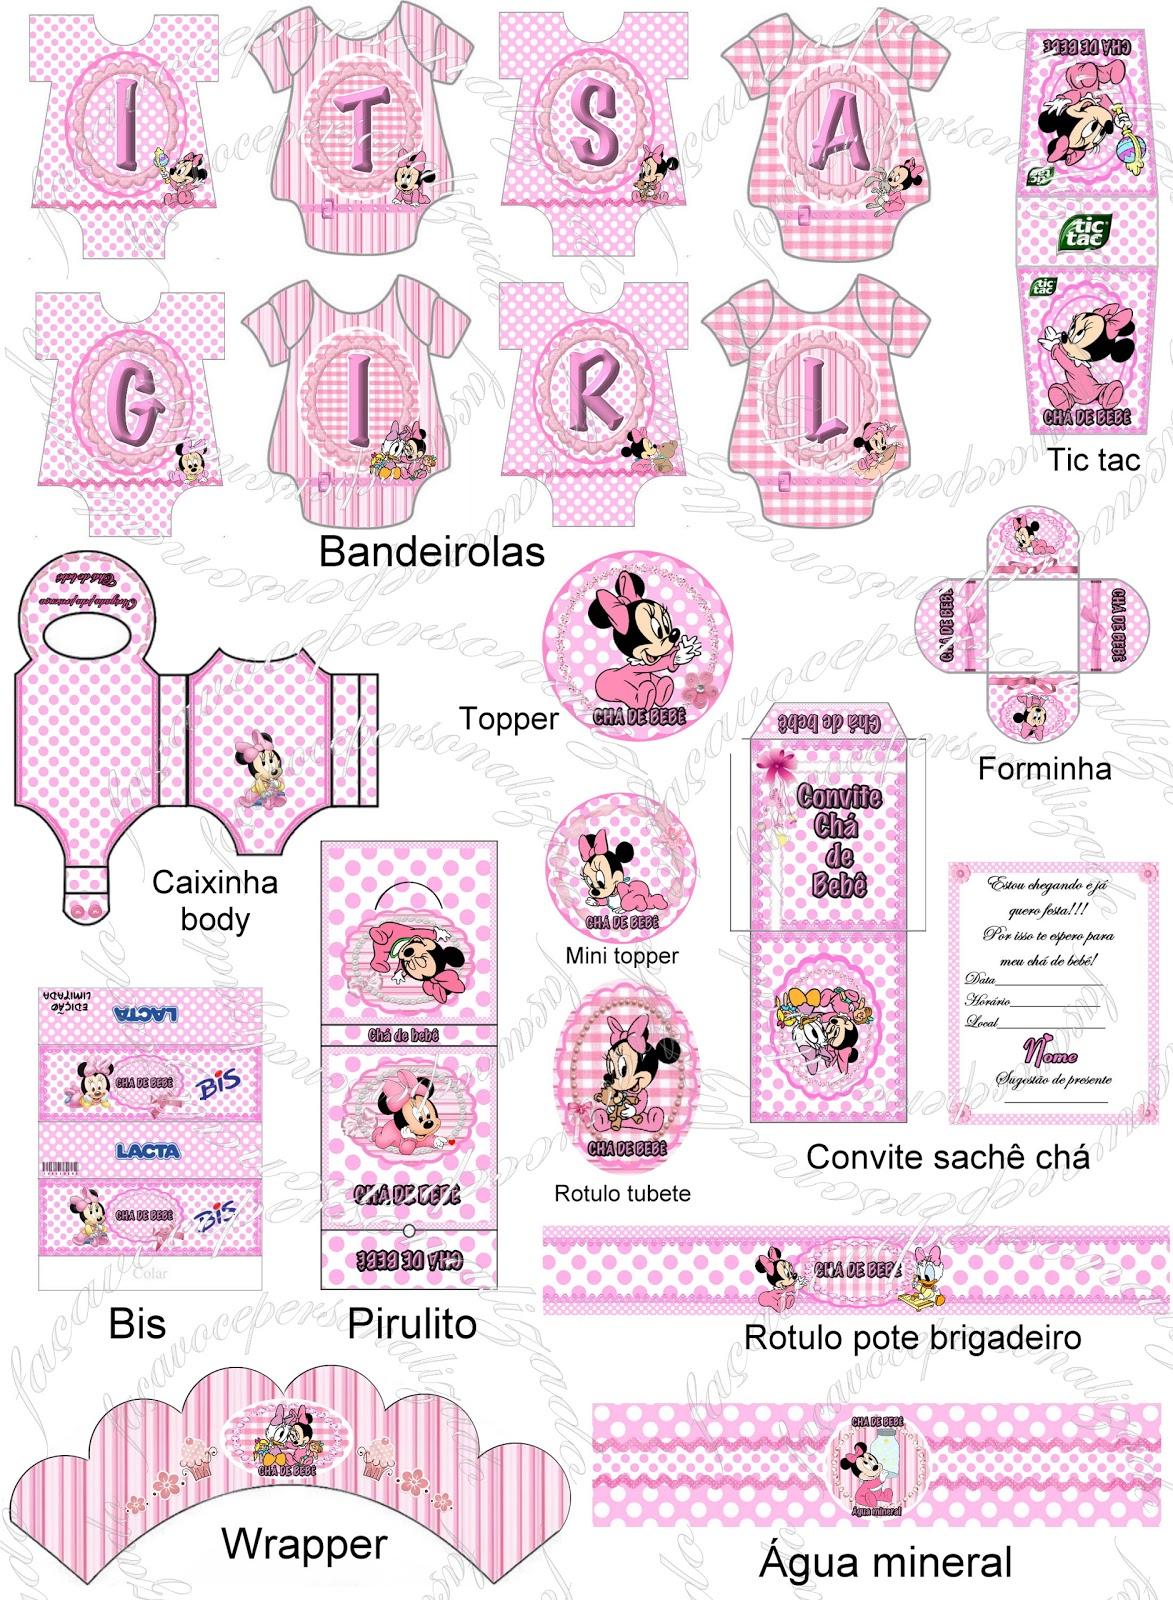 Faca Voce Personalizados Kit Festa Cha De Bebe Minnie Baby Rosa E